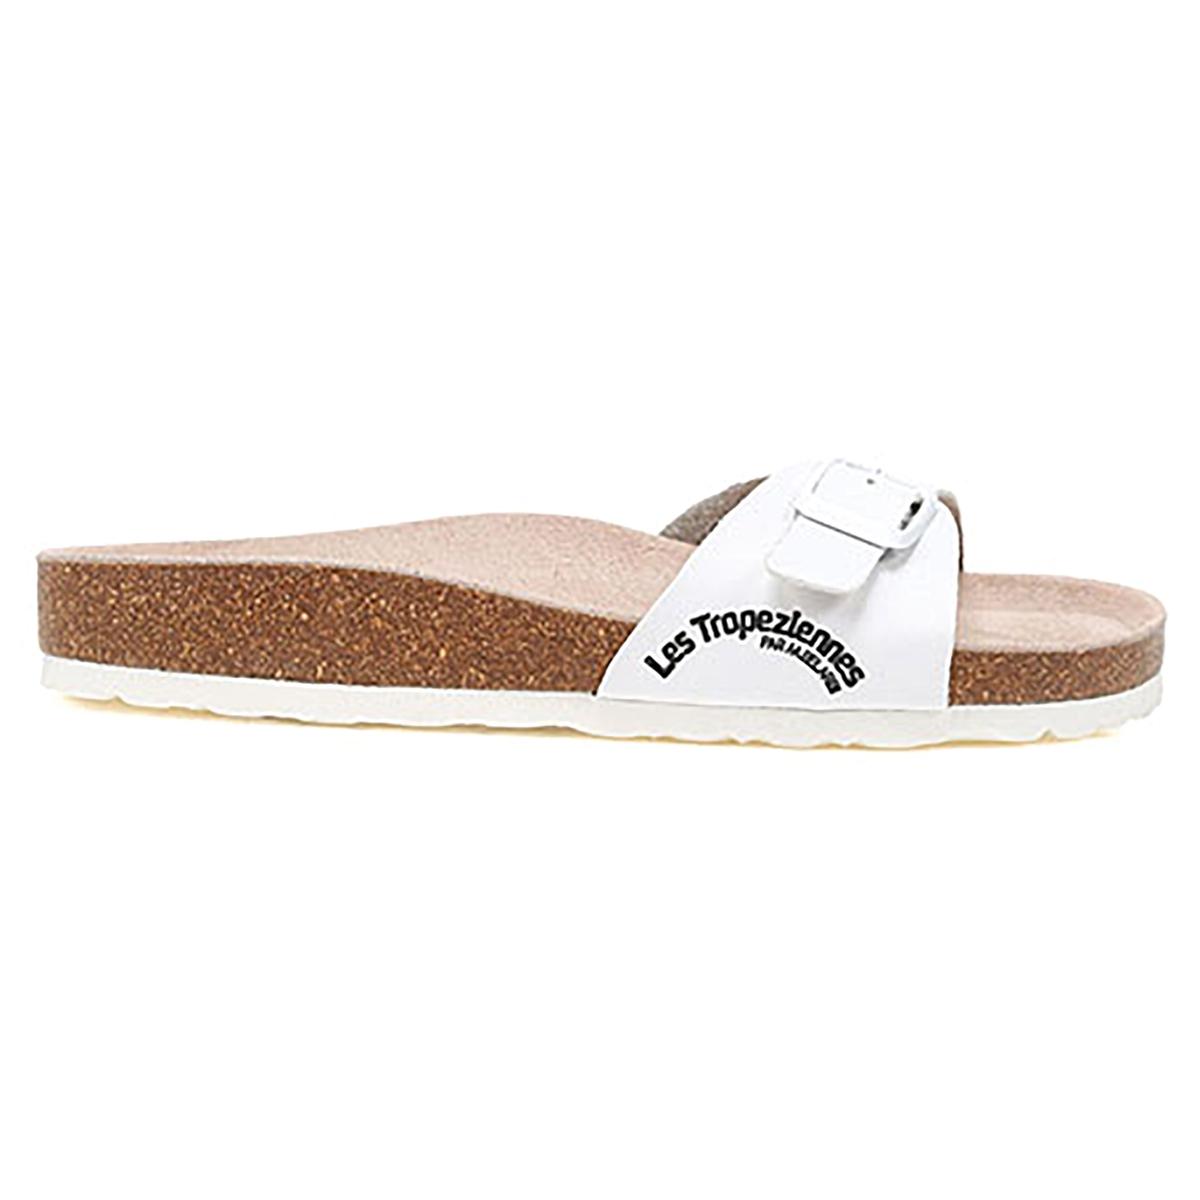 Туфли без задника синтетические цены онлайн